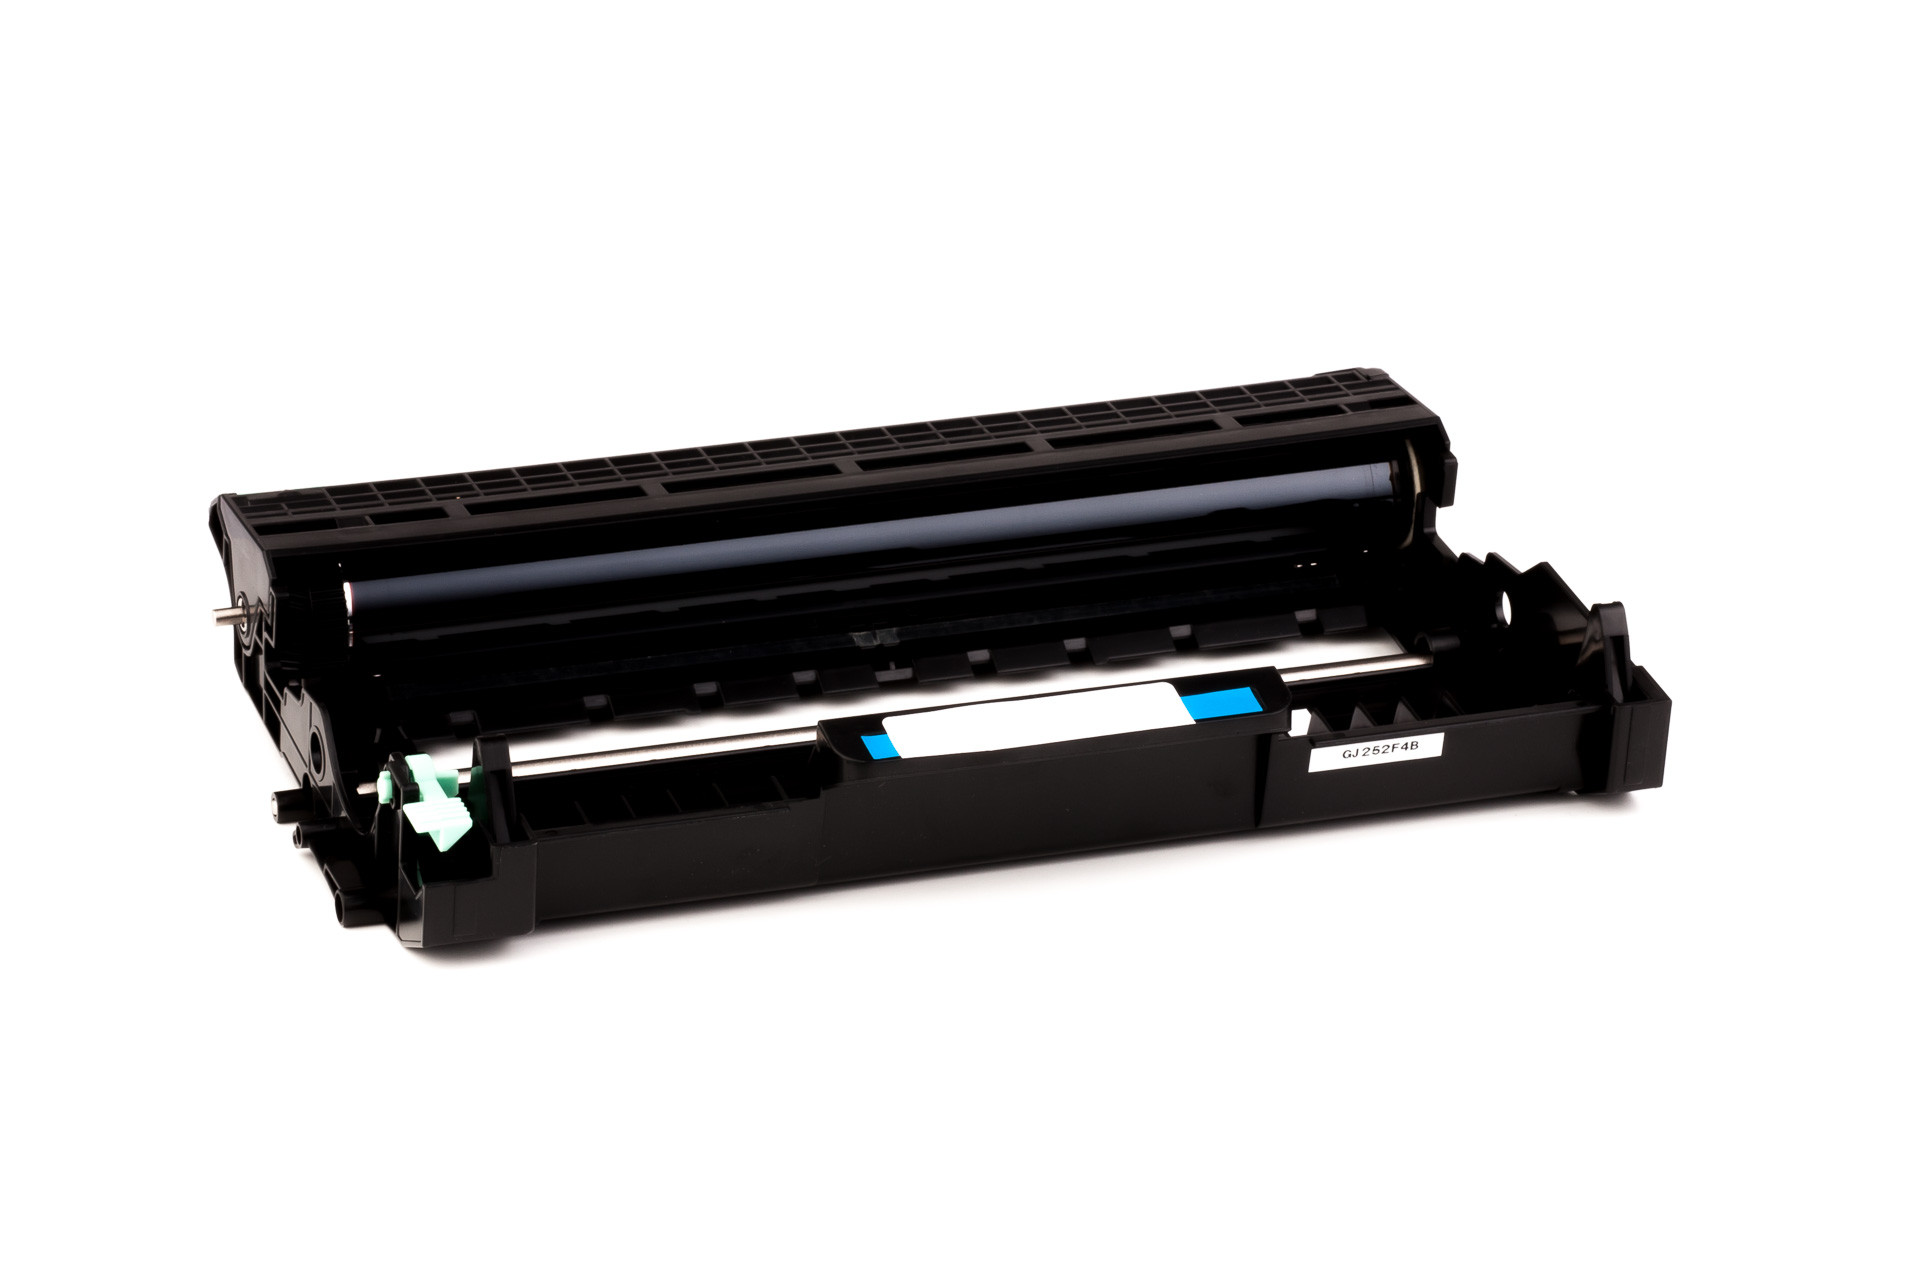 Tambour (alternatif) compatible à Brother HL 2130 / 2240 / 2250 / 2270 / DCP 7055 / 7057 / 7060 / 7065 / 7070 / MFC 7360 / 7460 / 7860  // DR2200 / DR 2200 /// universal Drum also for DR2210 / DR2010